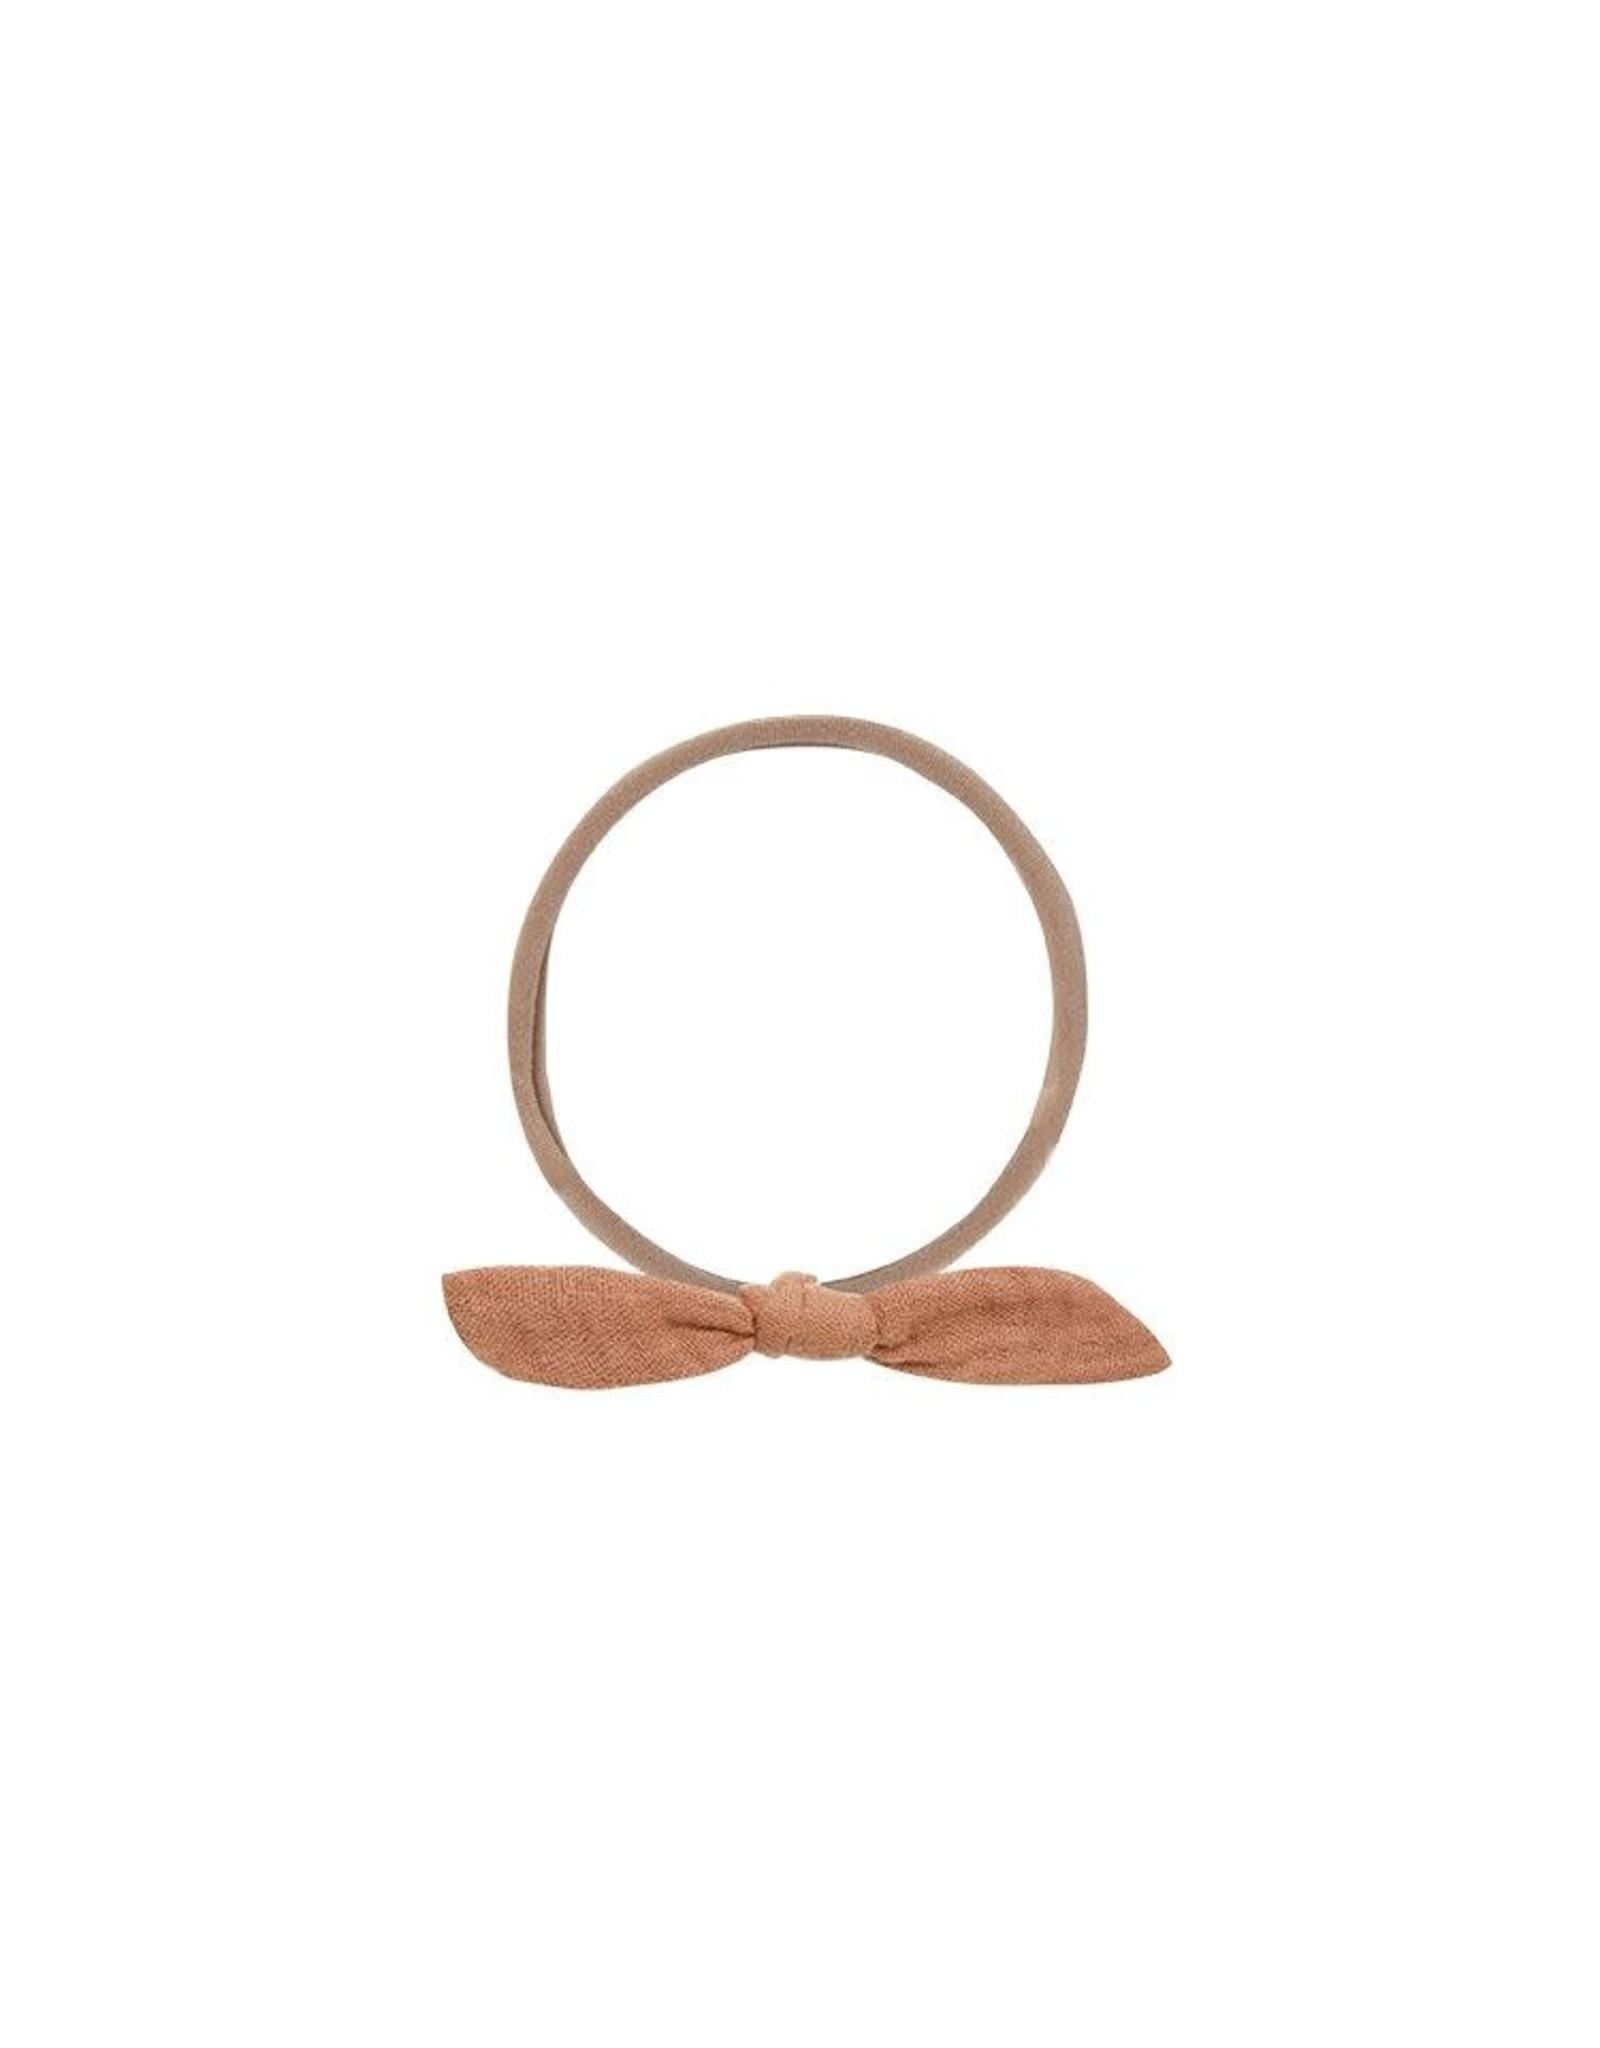 Rylee and Cru knot headband- terracotta